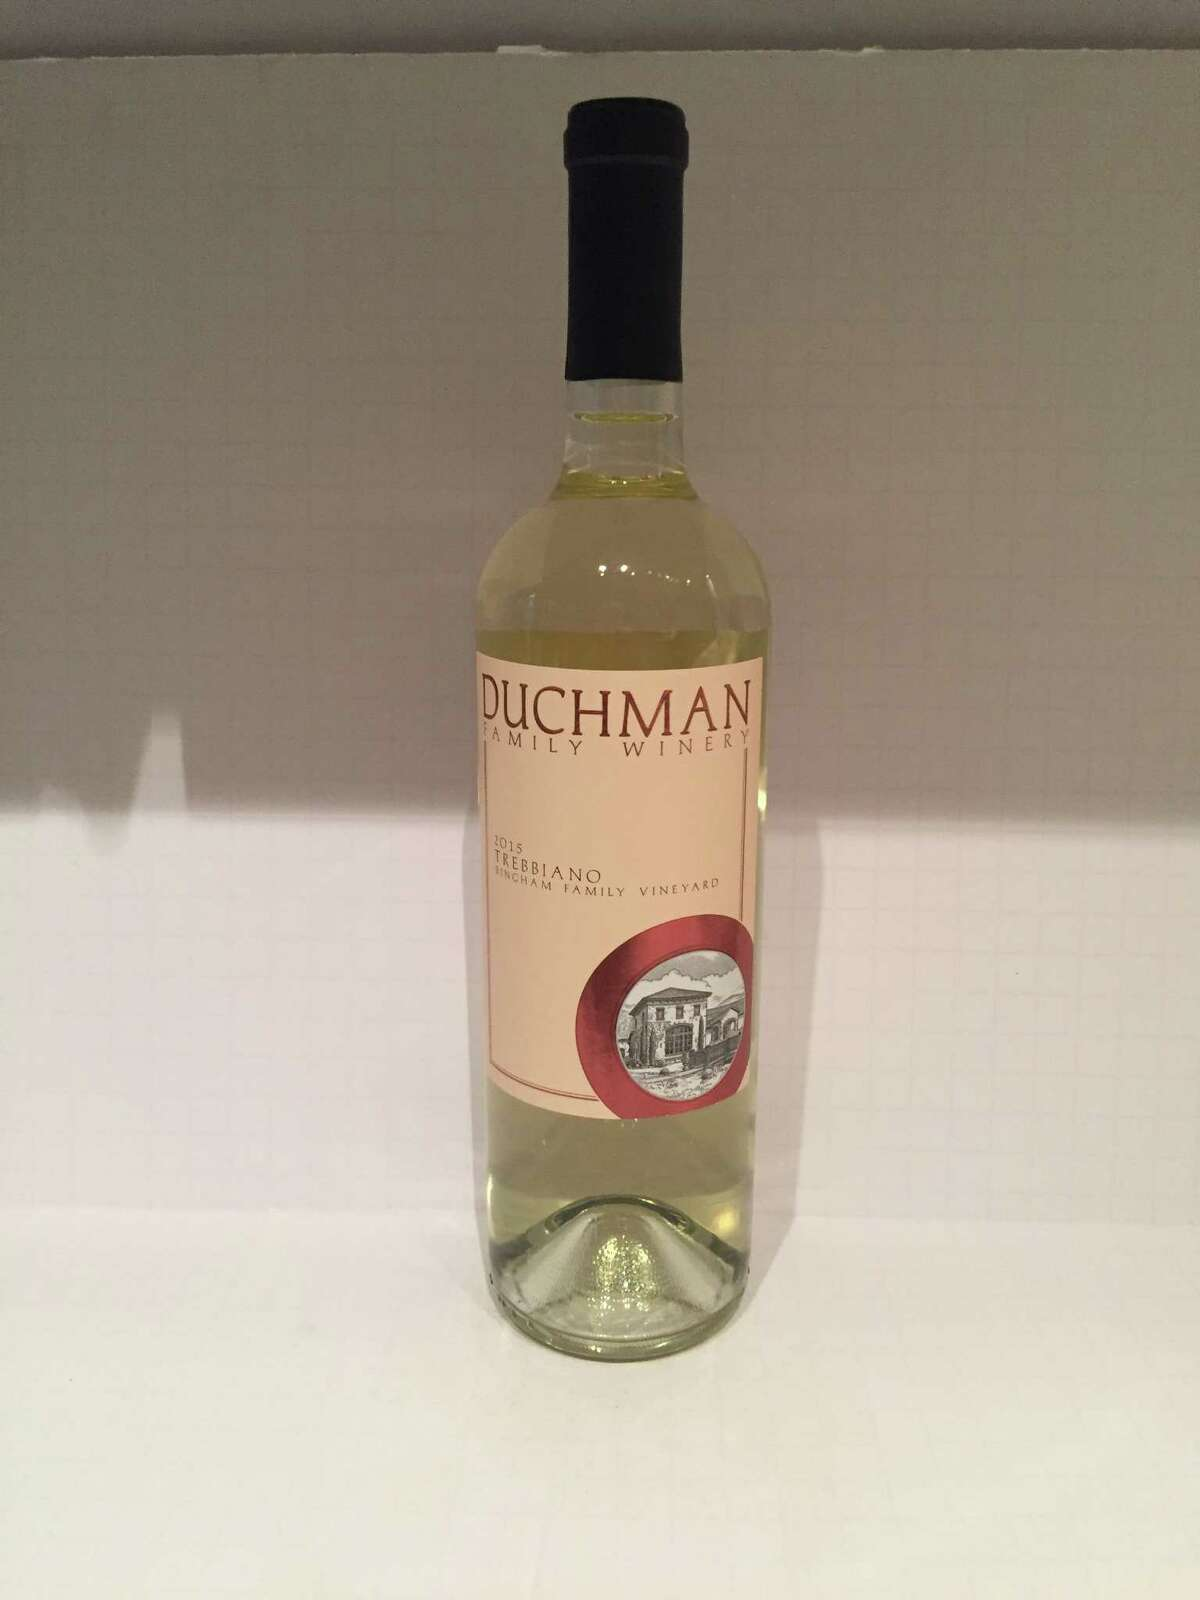 2015 Duchman Family Vineyards Trebbiano